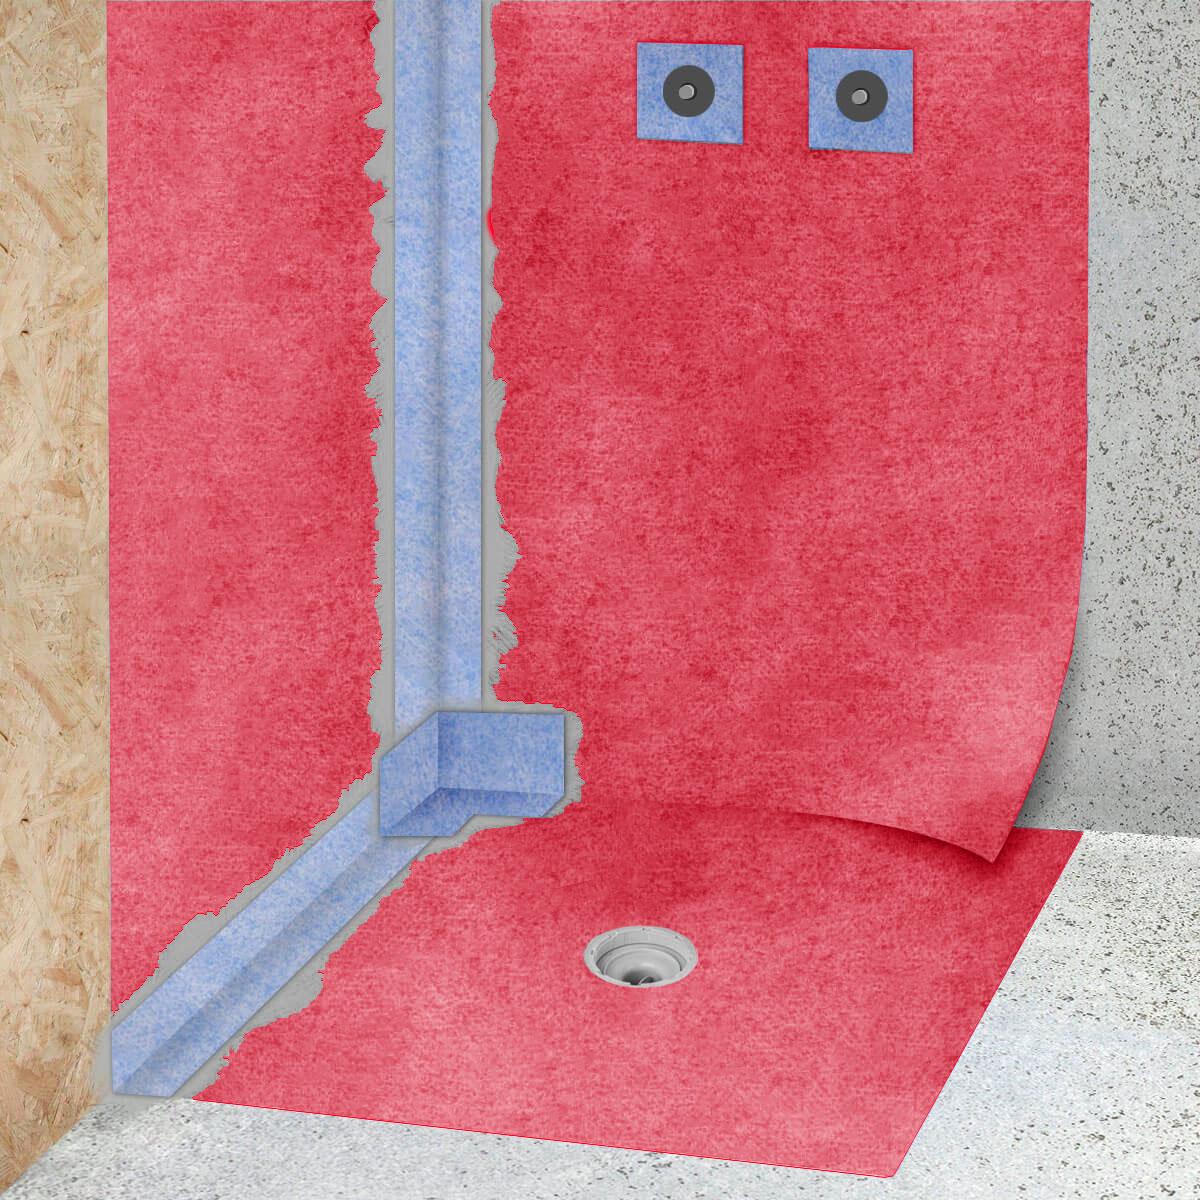 duschelement befliesbar duschboard duschtasse bodeneben duschwanne ebenerdig top ebay. Black Bedroom Furniture Sets. Home Design Ideas